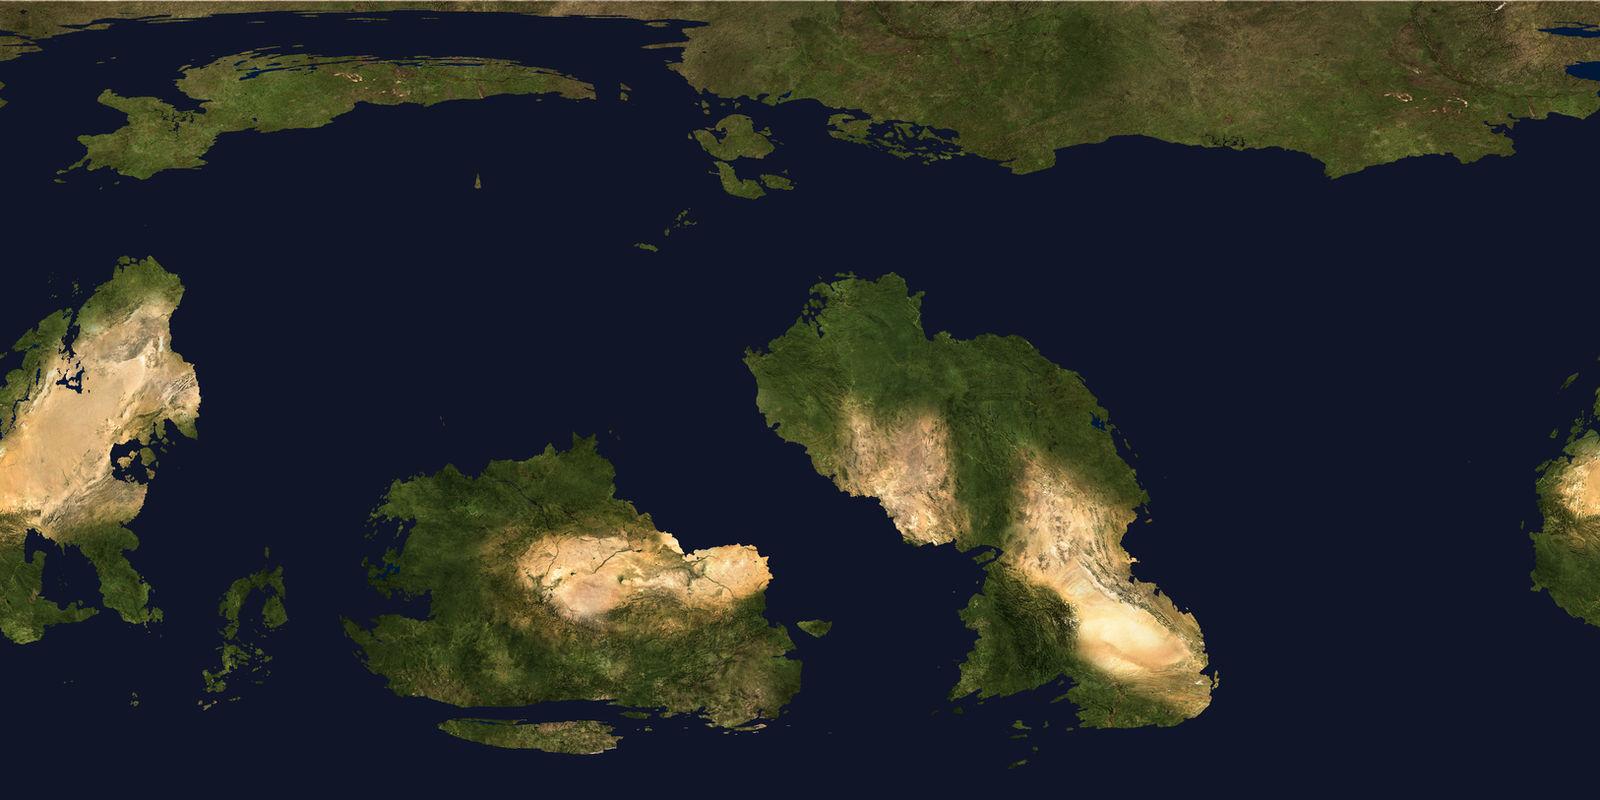 Venus Terraformed Climate Map on mercator venus map, mars venus map, venus globe map, venus as a map, venus elevation map, full destiny venus map, terraforming venus map, mars with water map, venus topographic map, venus ocean map, continents of venus map, temperature of venus map, terraform venus map, venus surface map, venus texture map, earthsea map, mercury surface map, space map, venus with water map, europa moon map,